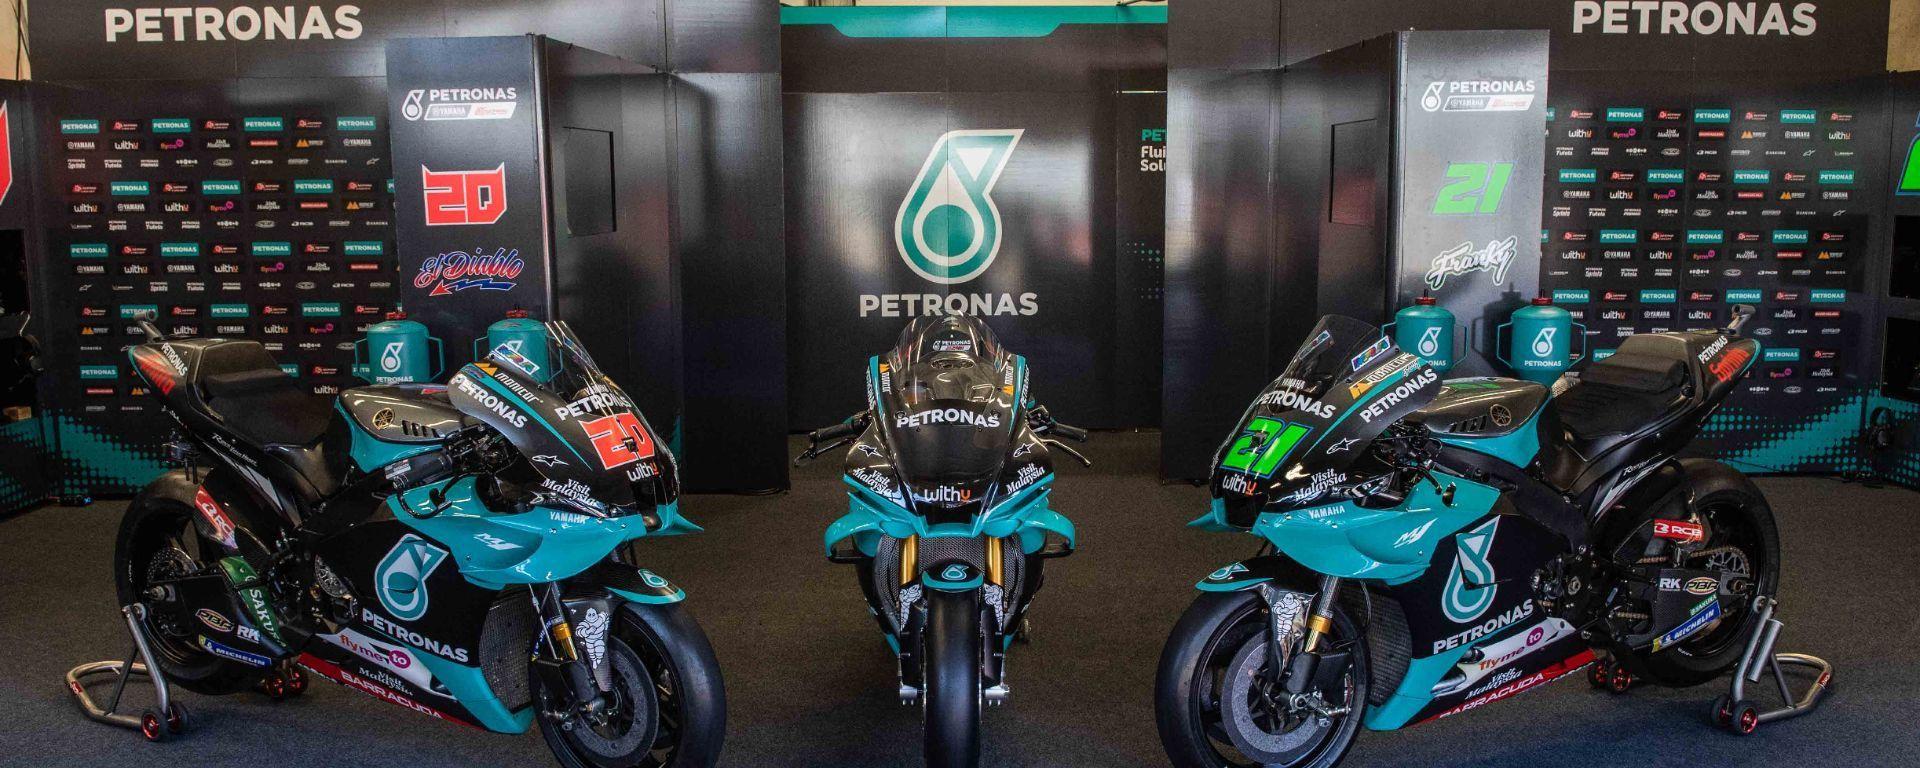 Yamaha R1 Petronas nel box vino alle MotoGP